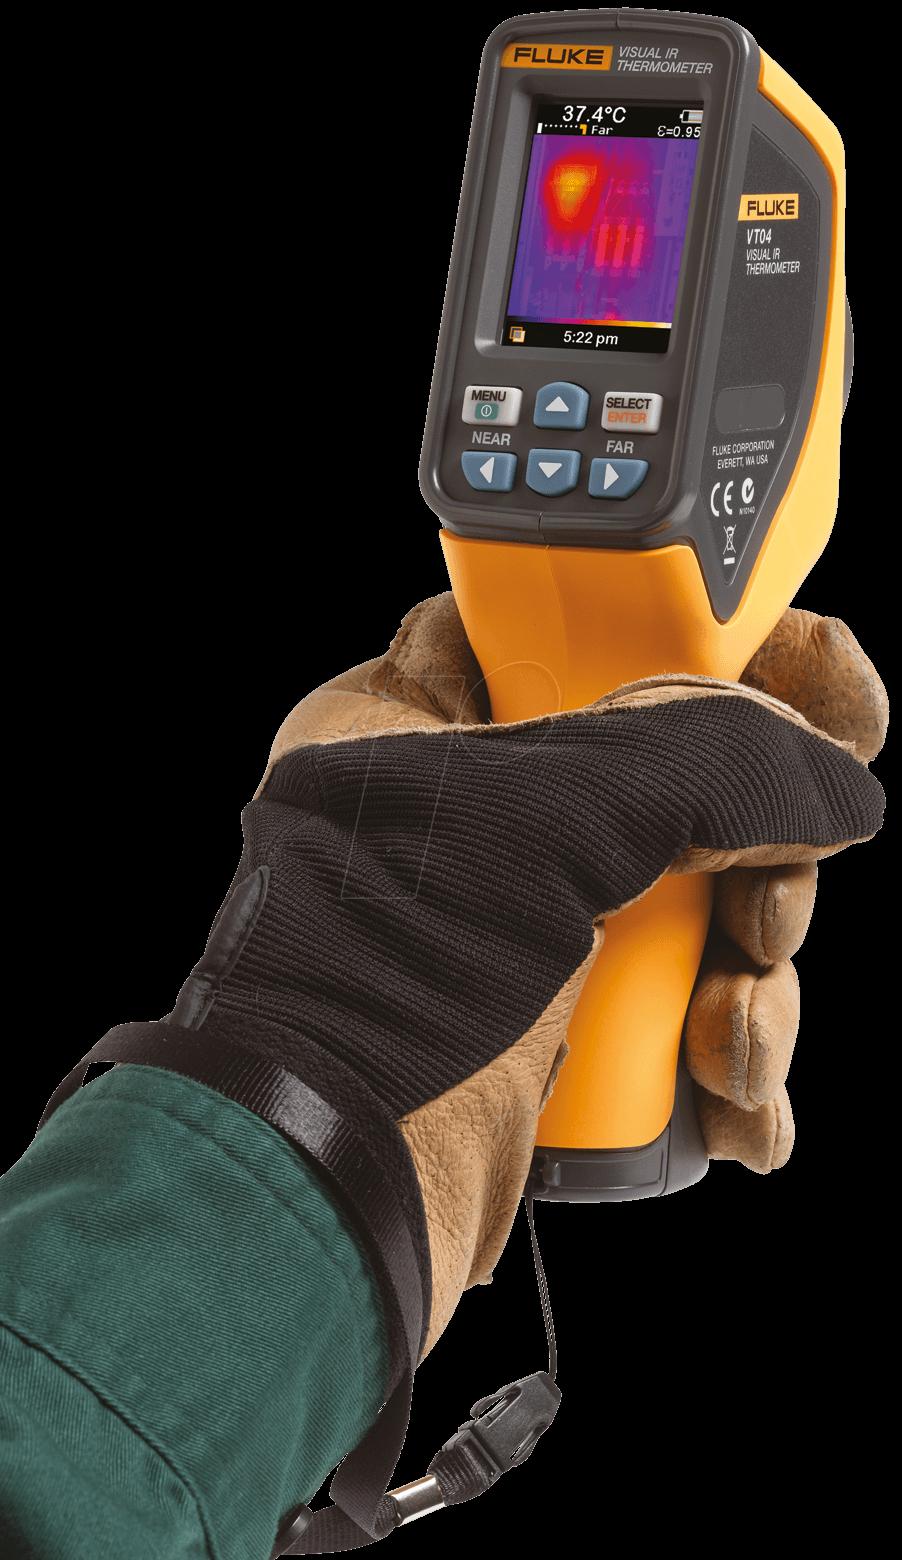 Fluke Vt04 Visual Ir Thermometer At Reichelt Elektronik Infrared 59 Max 4366444